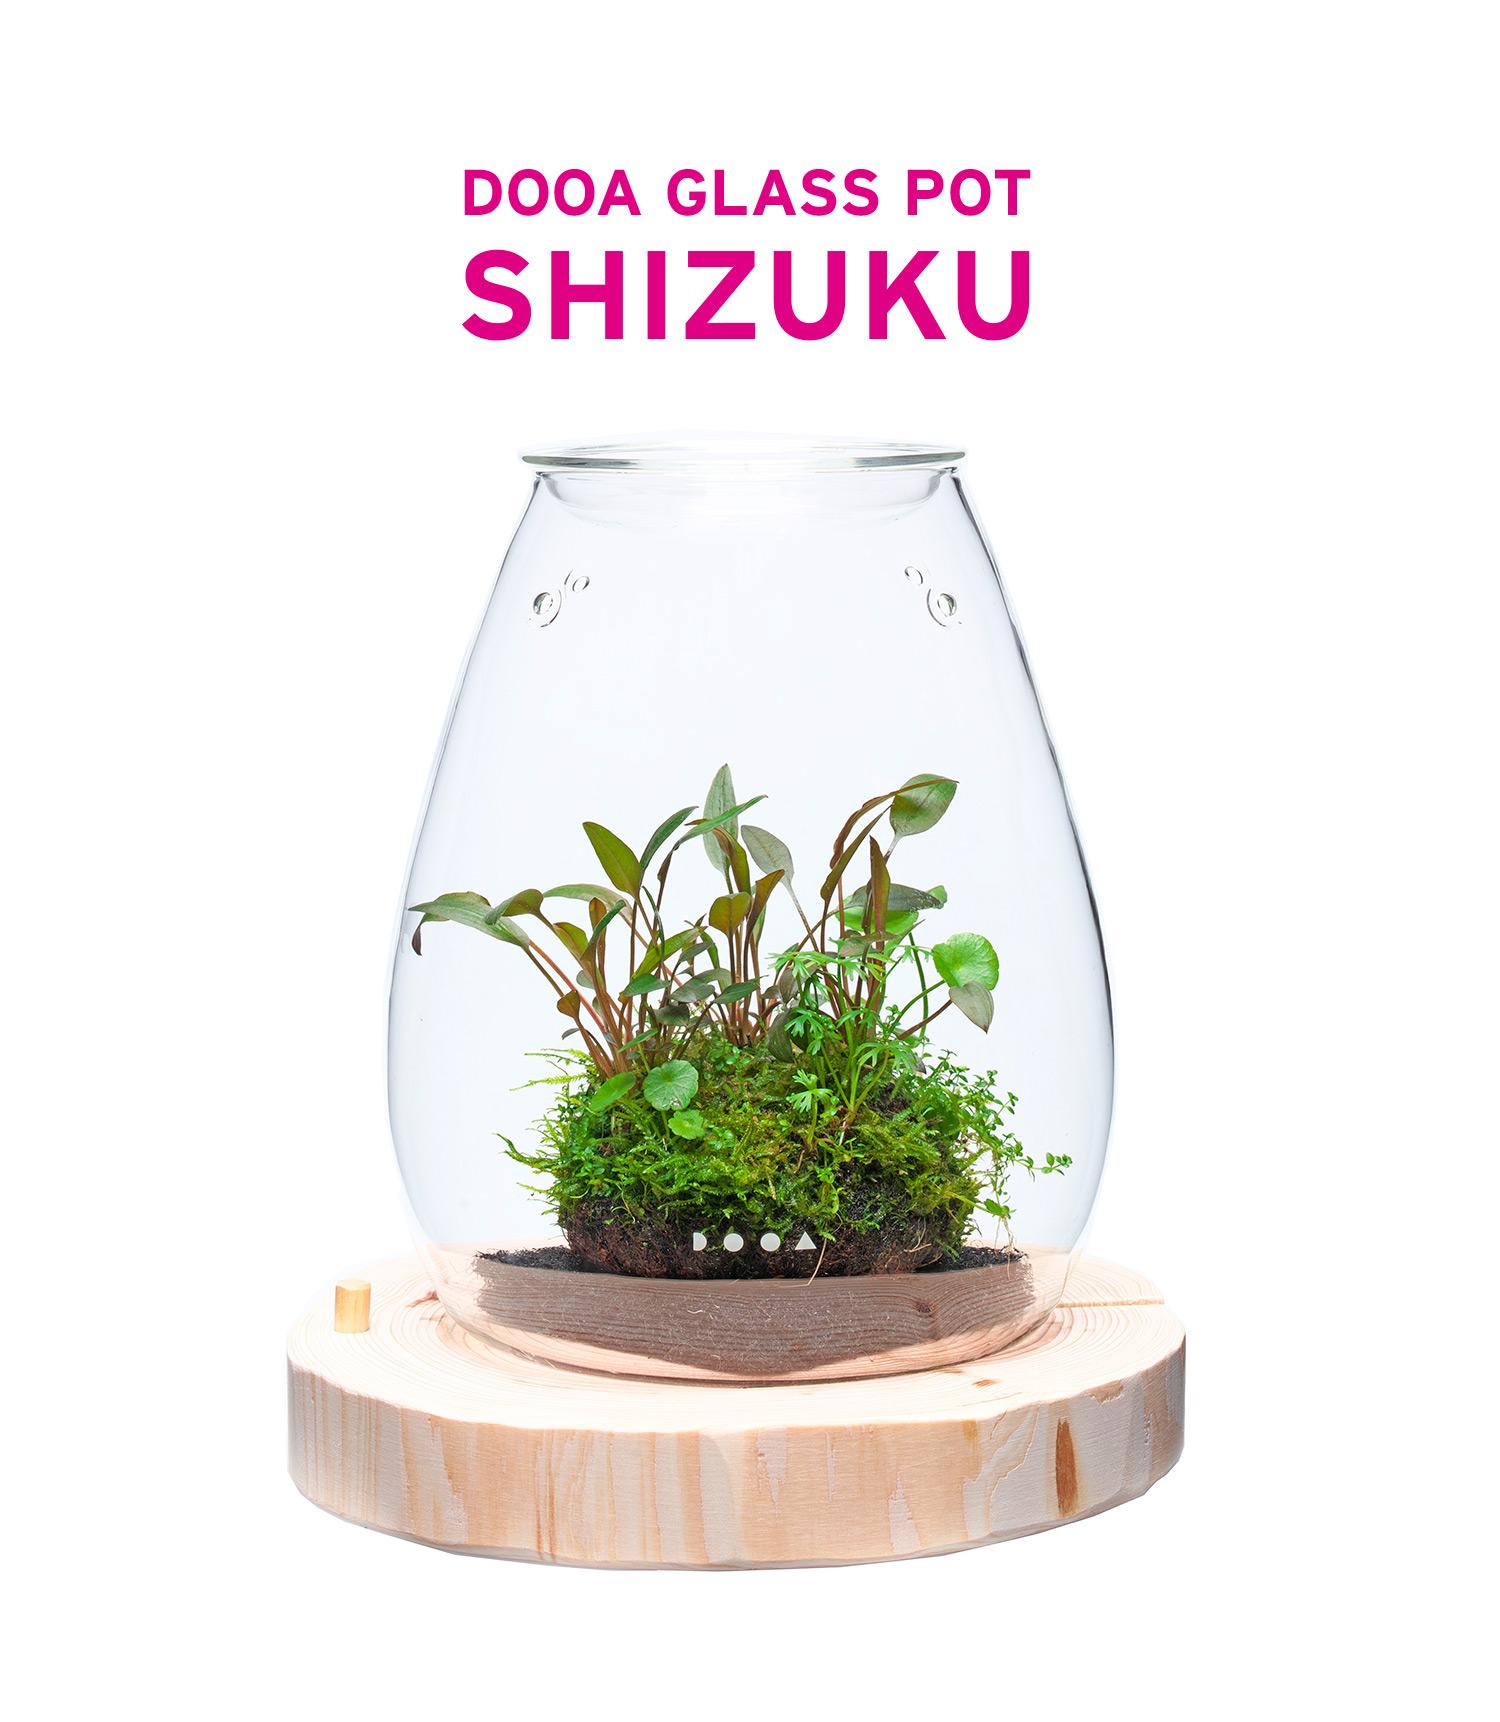 DOOA ガラスポット SHIZUKUってなに?